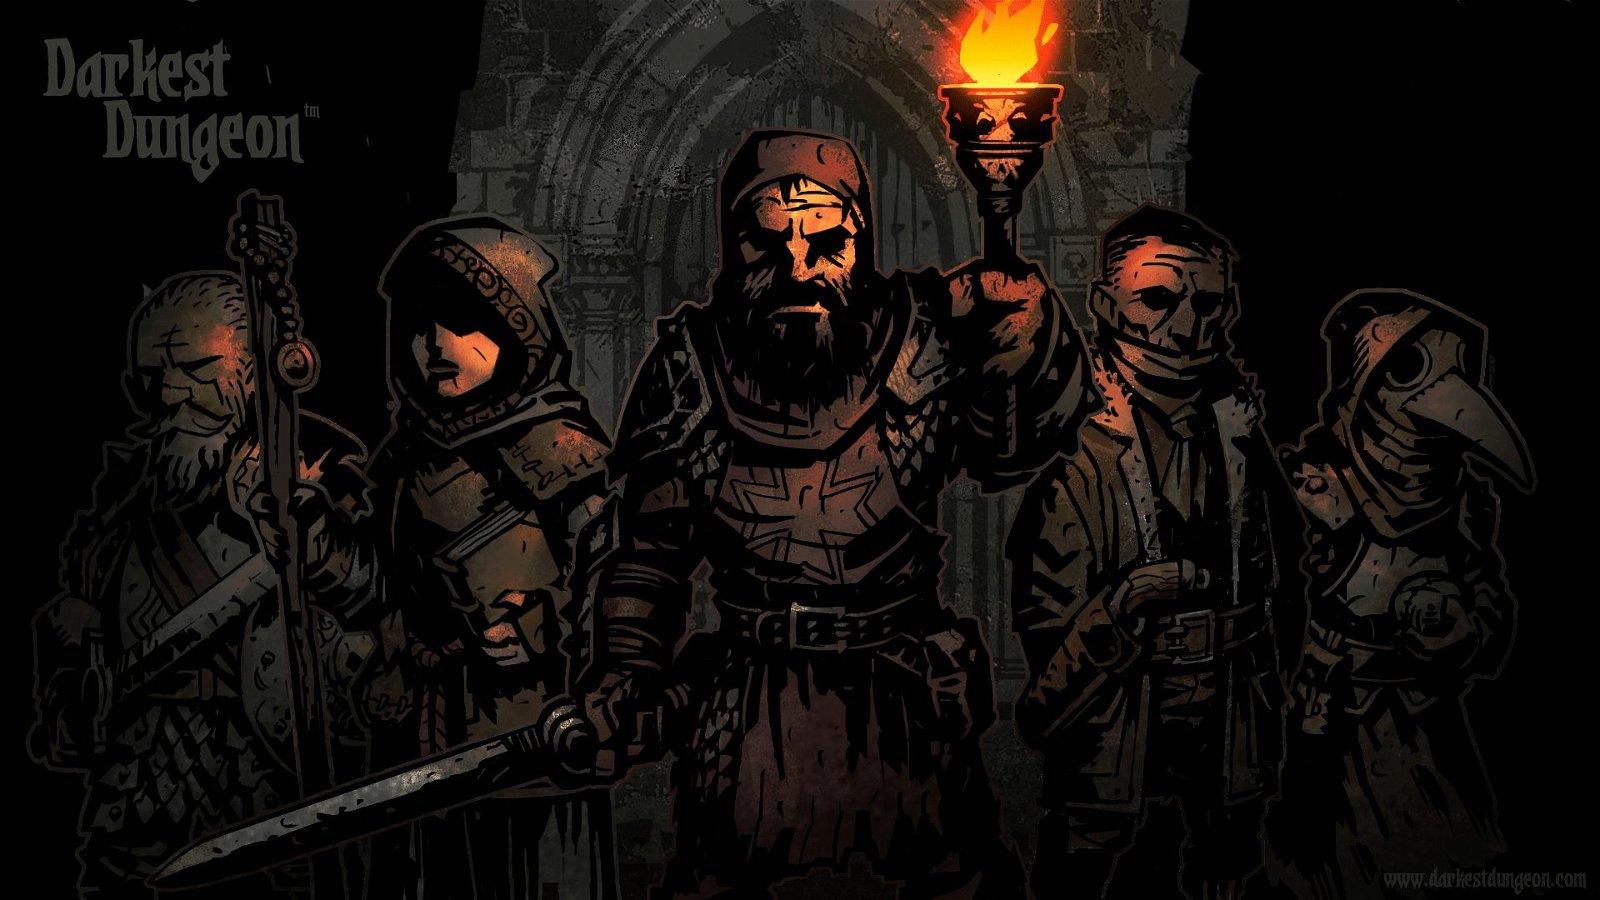 Red Hook Studios Teases Darkest Dungeon on Switch 2